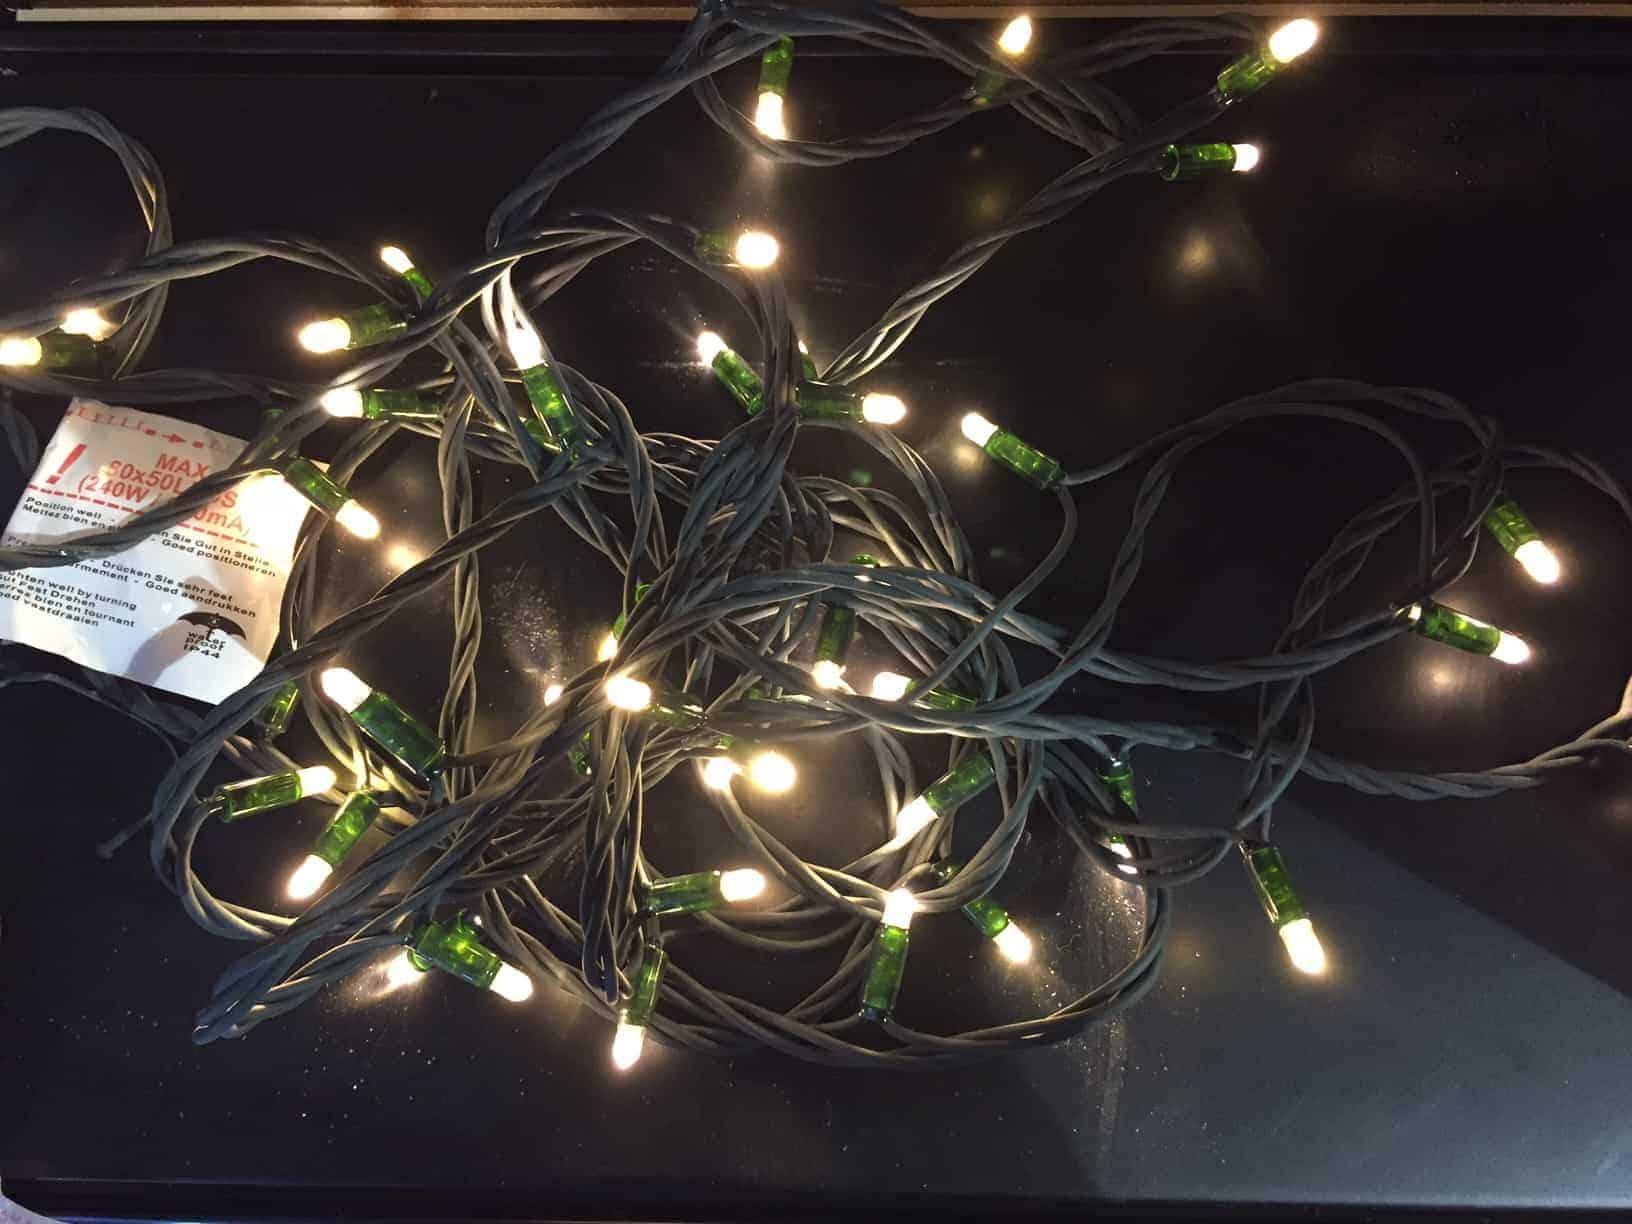 Led Outdoor Christmas Lights.Led Xp Heavy Duty Connectable Outdoor Christmas Lights Warm White Fdl 10m